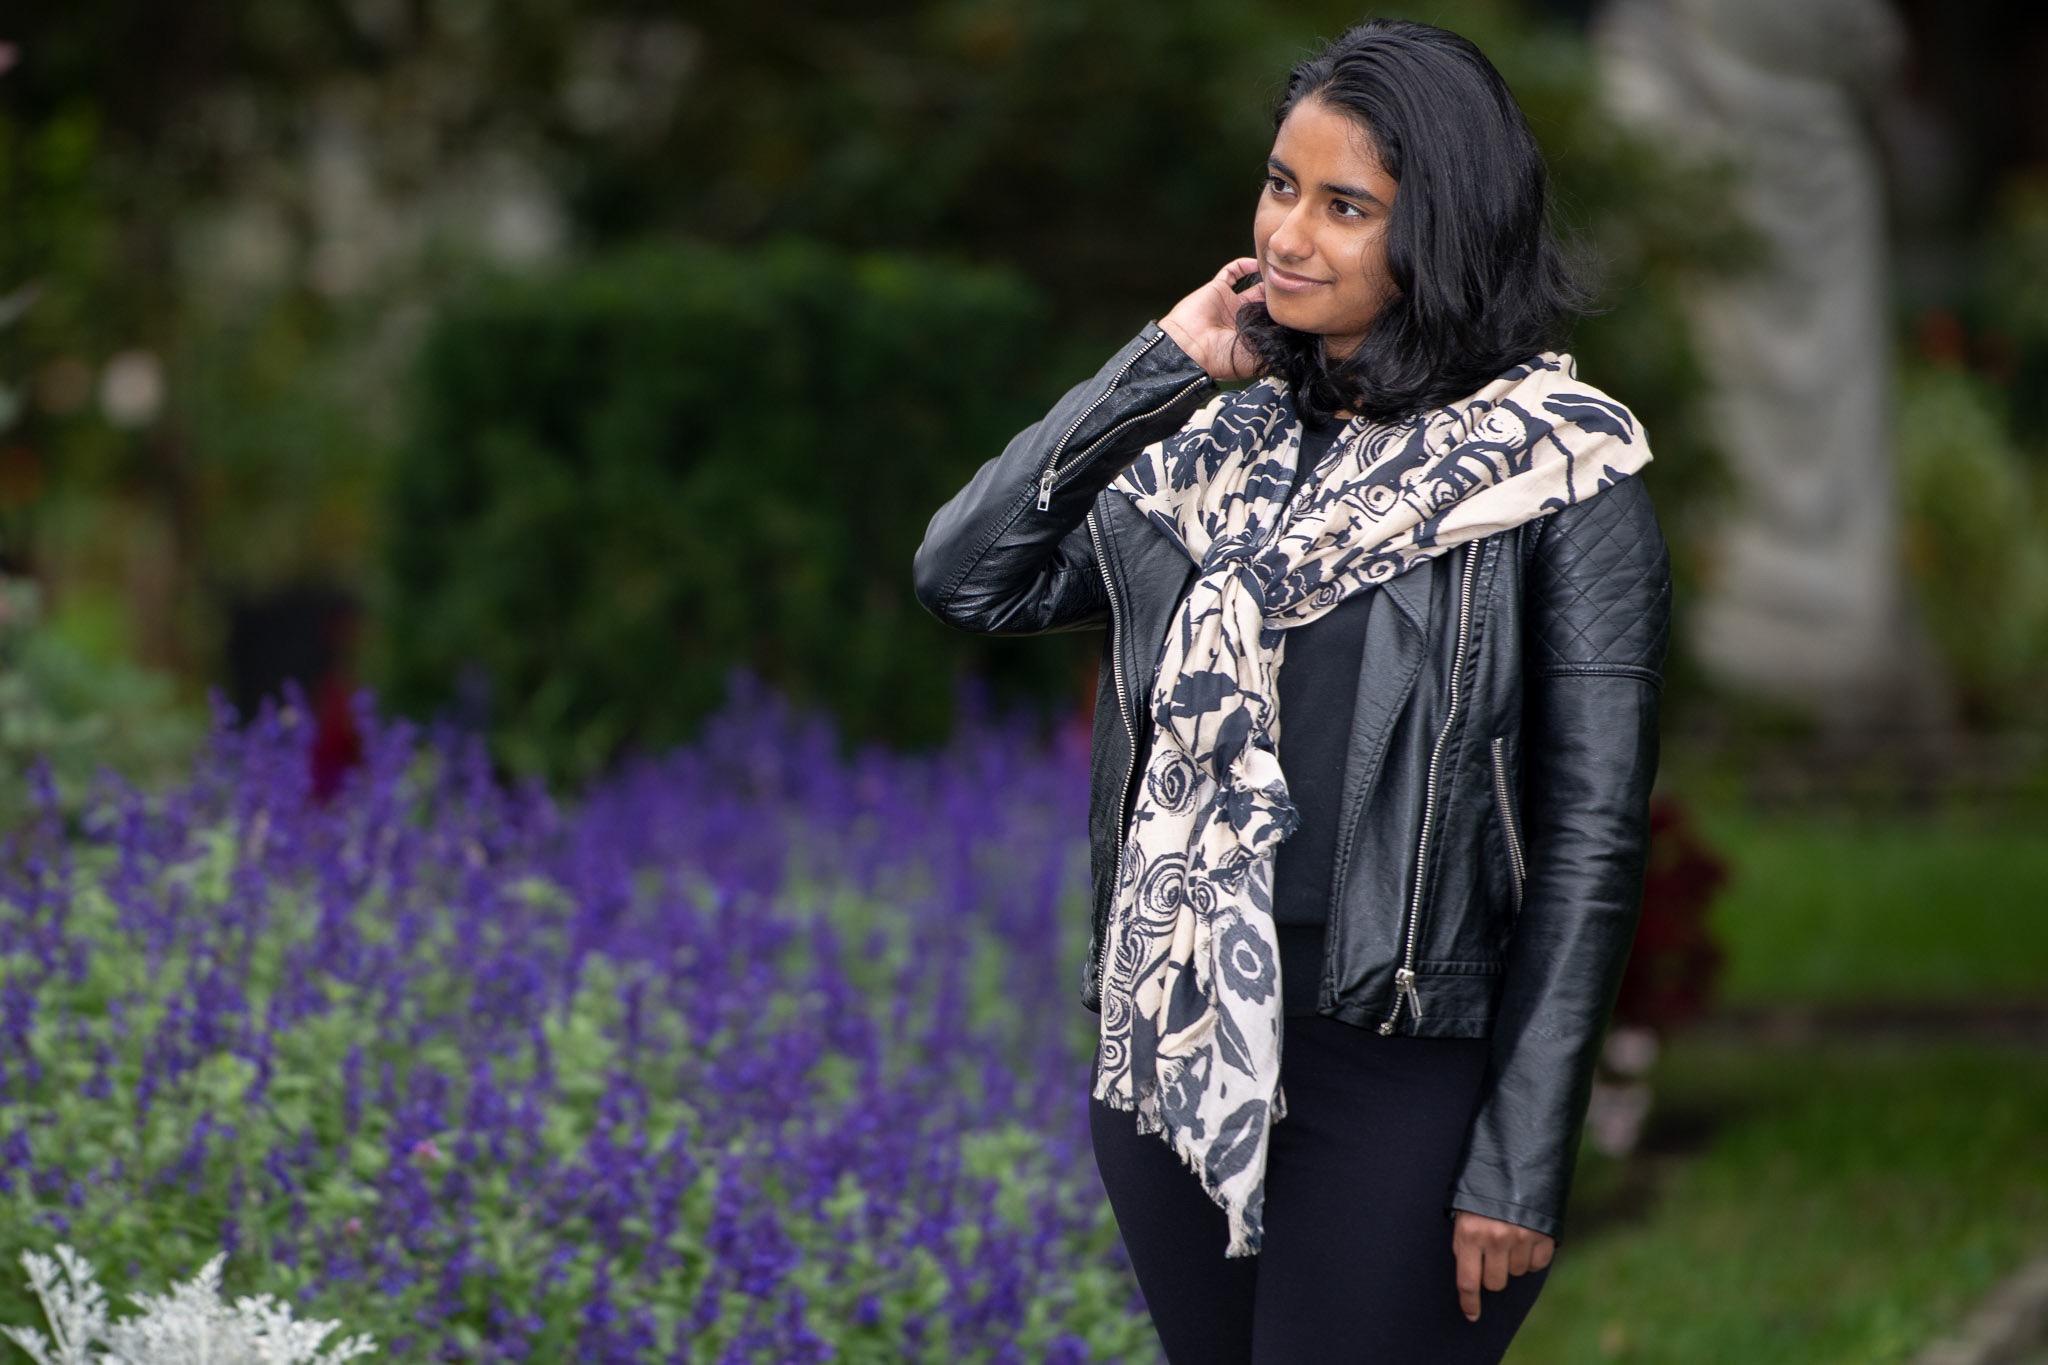 Sukanya wearing Black & Tan Female Flower Power Scarf at Elm Bank!